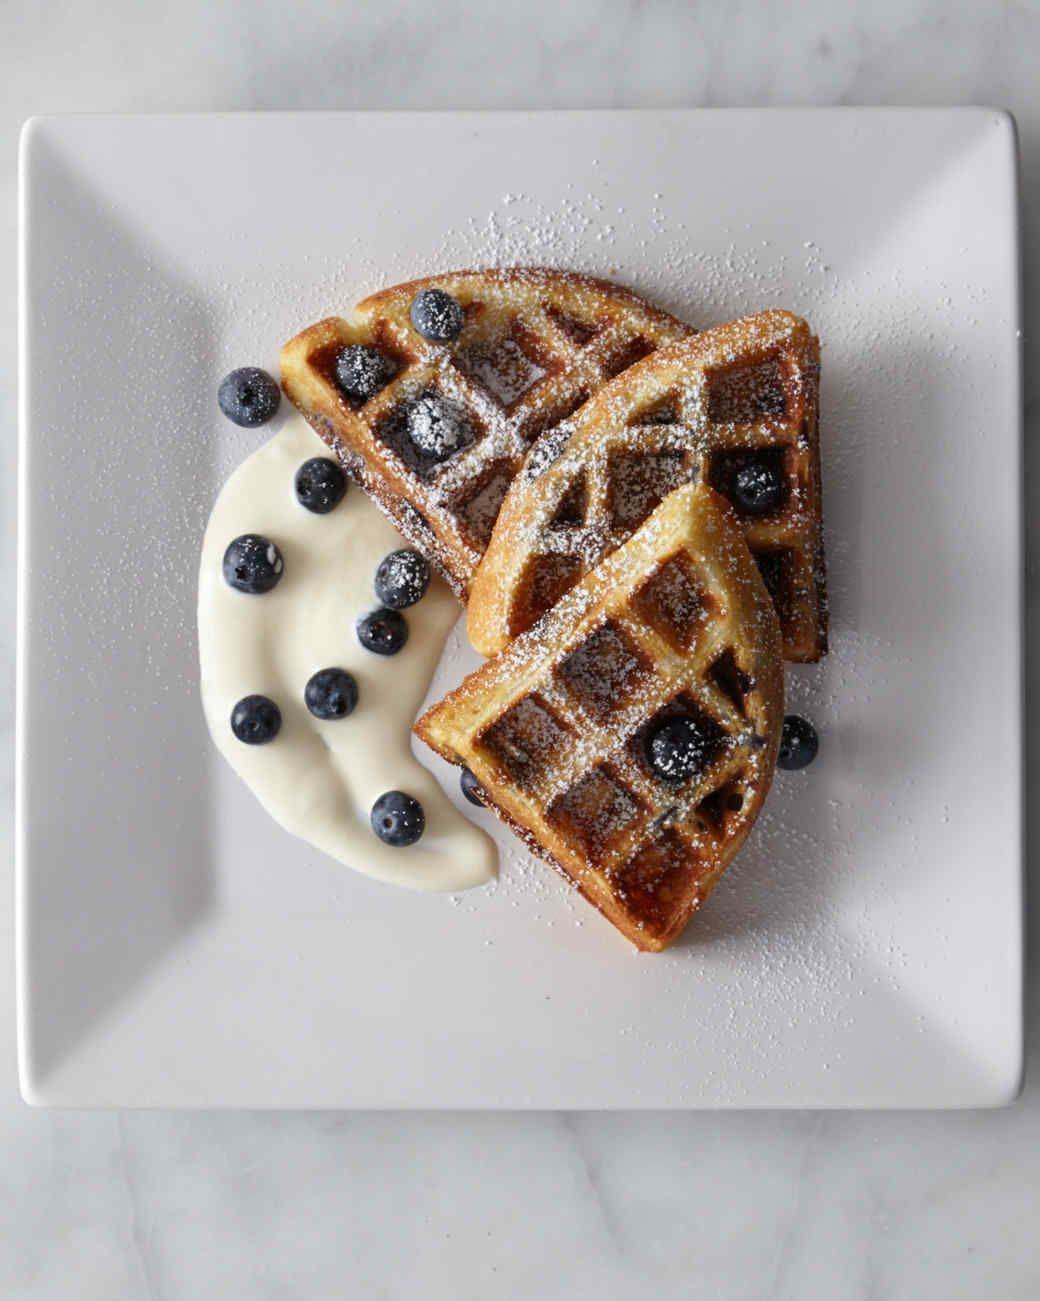 Blueberry Buttermilk Waffles Waffle Recipes Fun Baking Recipes Waffle Toppings